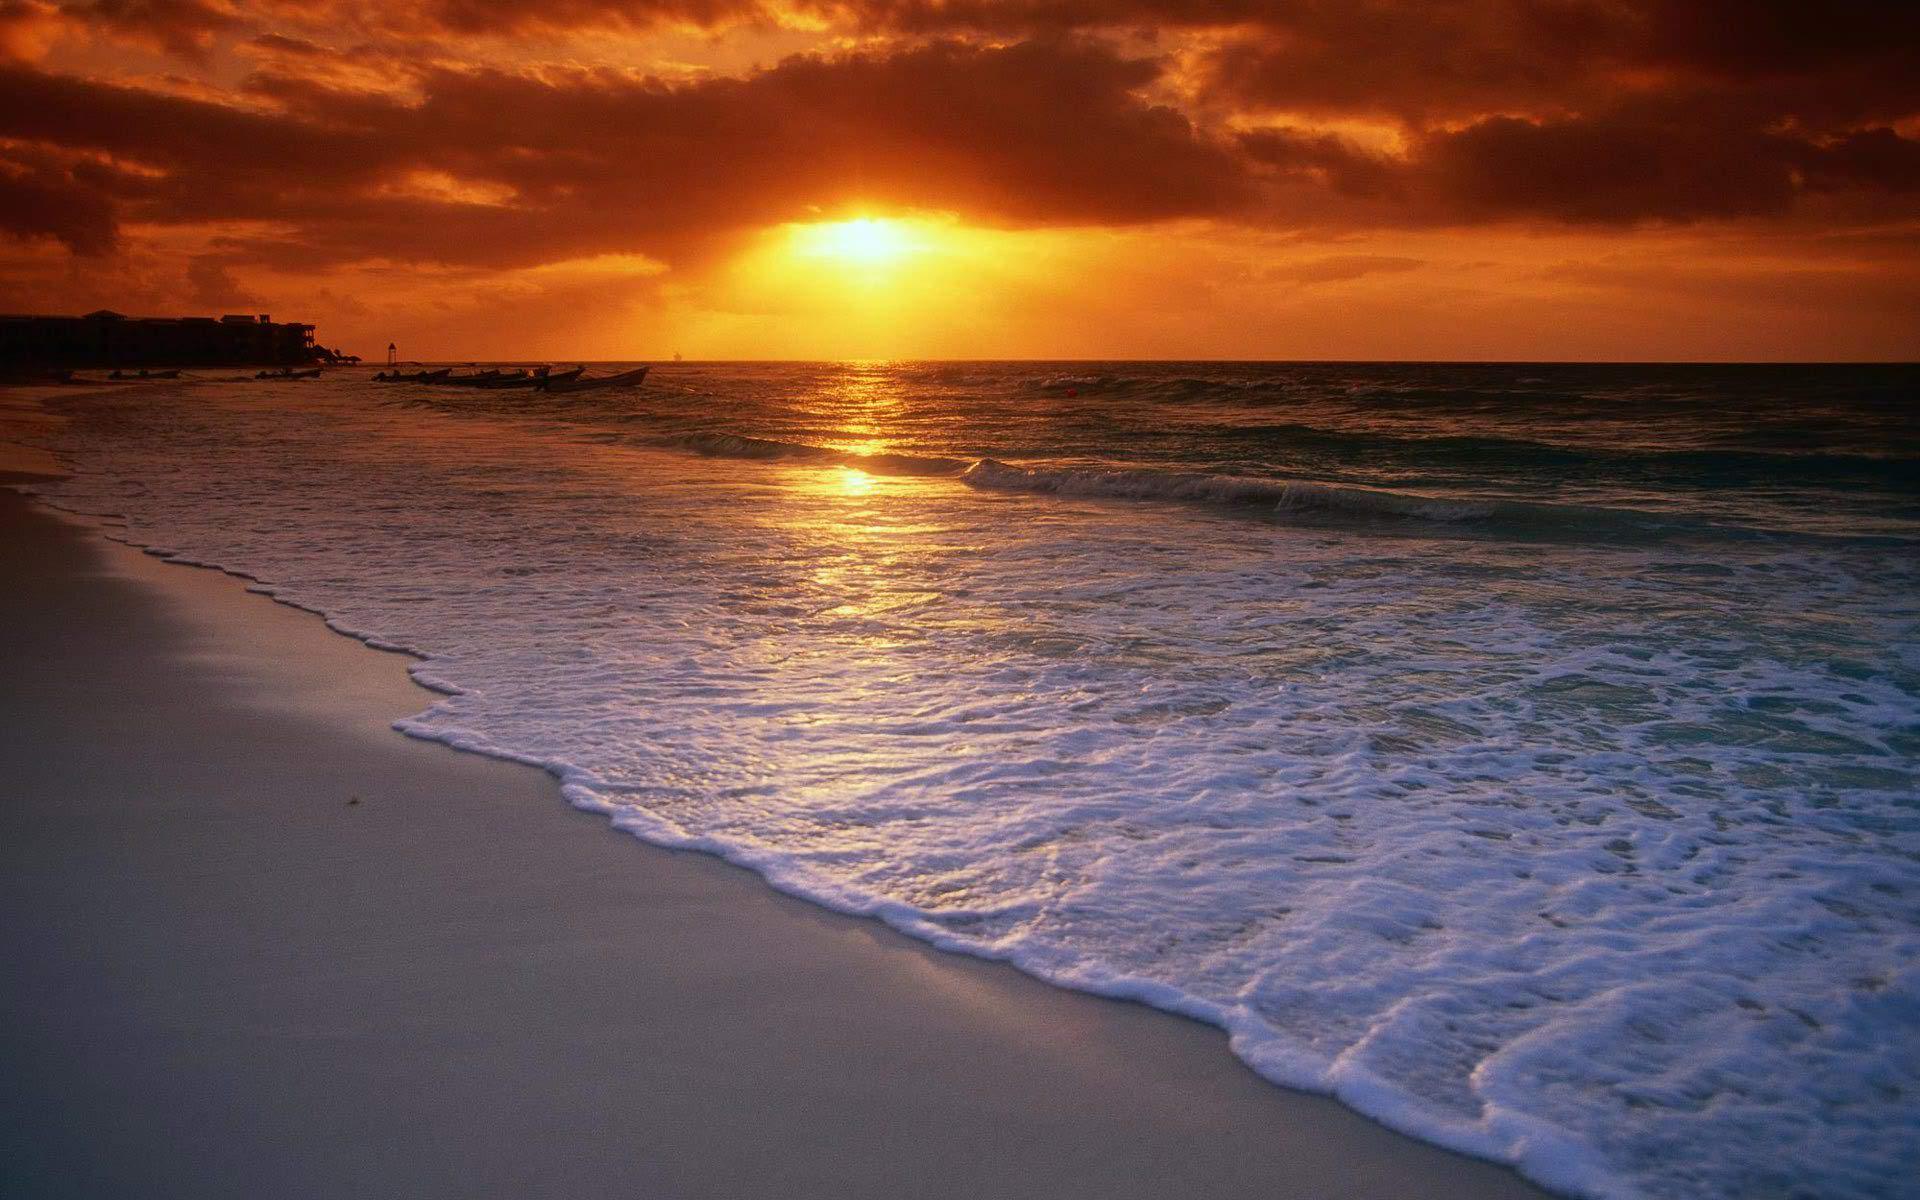 Widescreen Sunset Scene